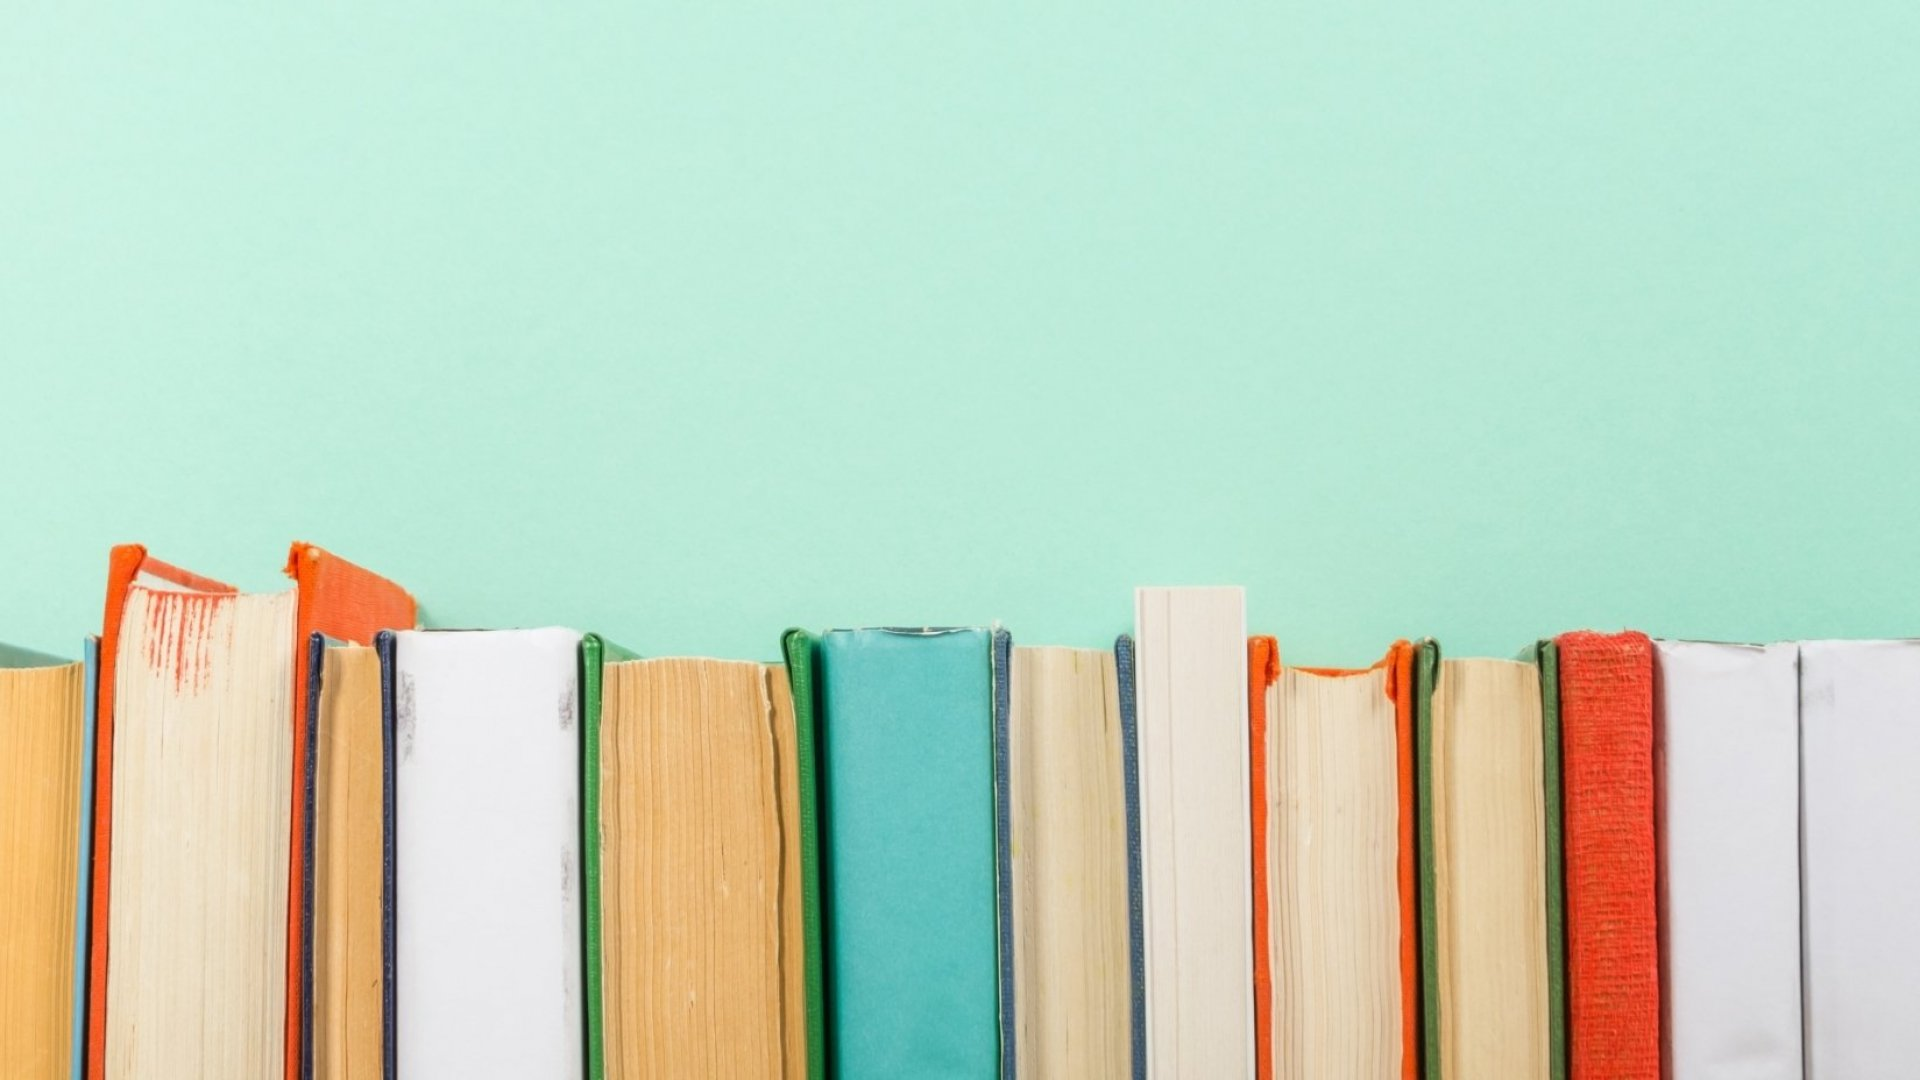 9 Social Media Books to Add to Your Bookshelf